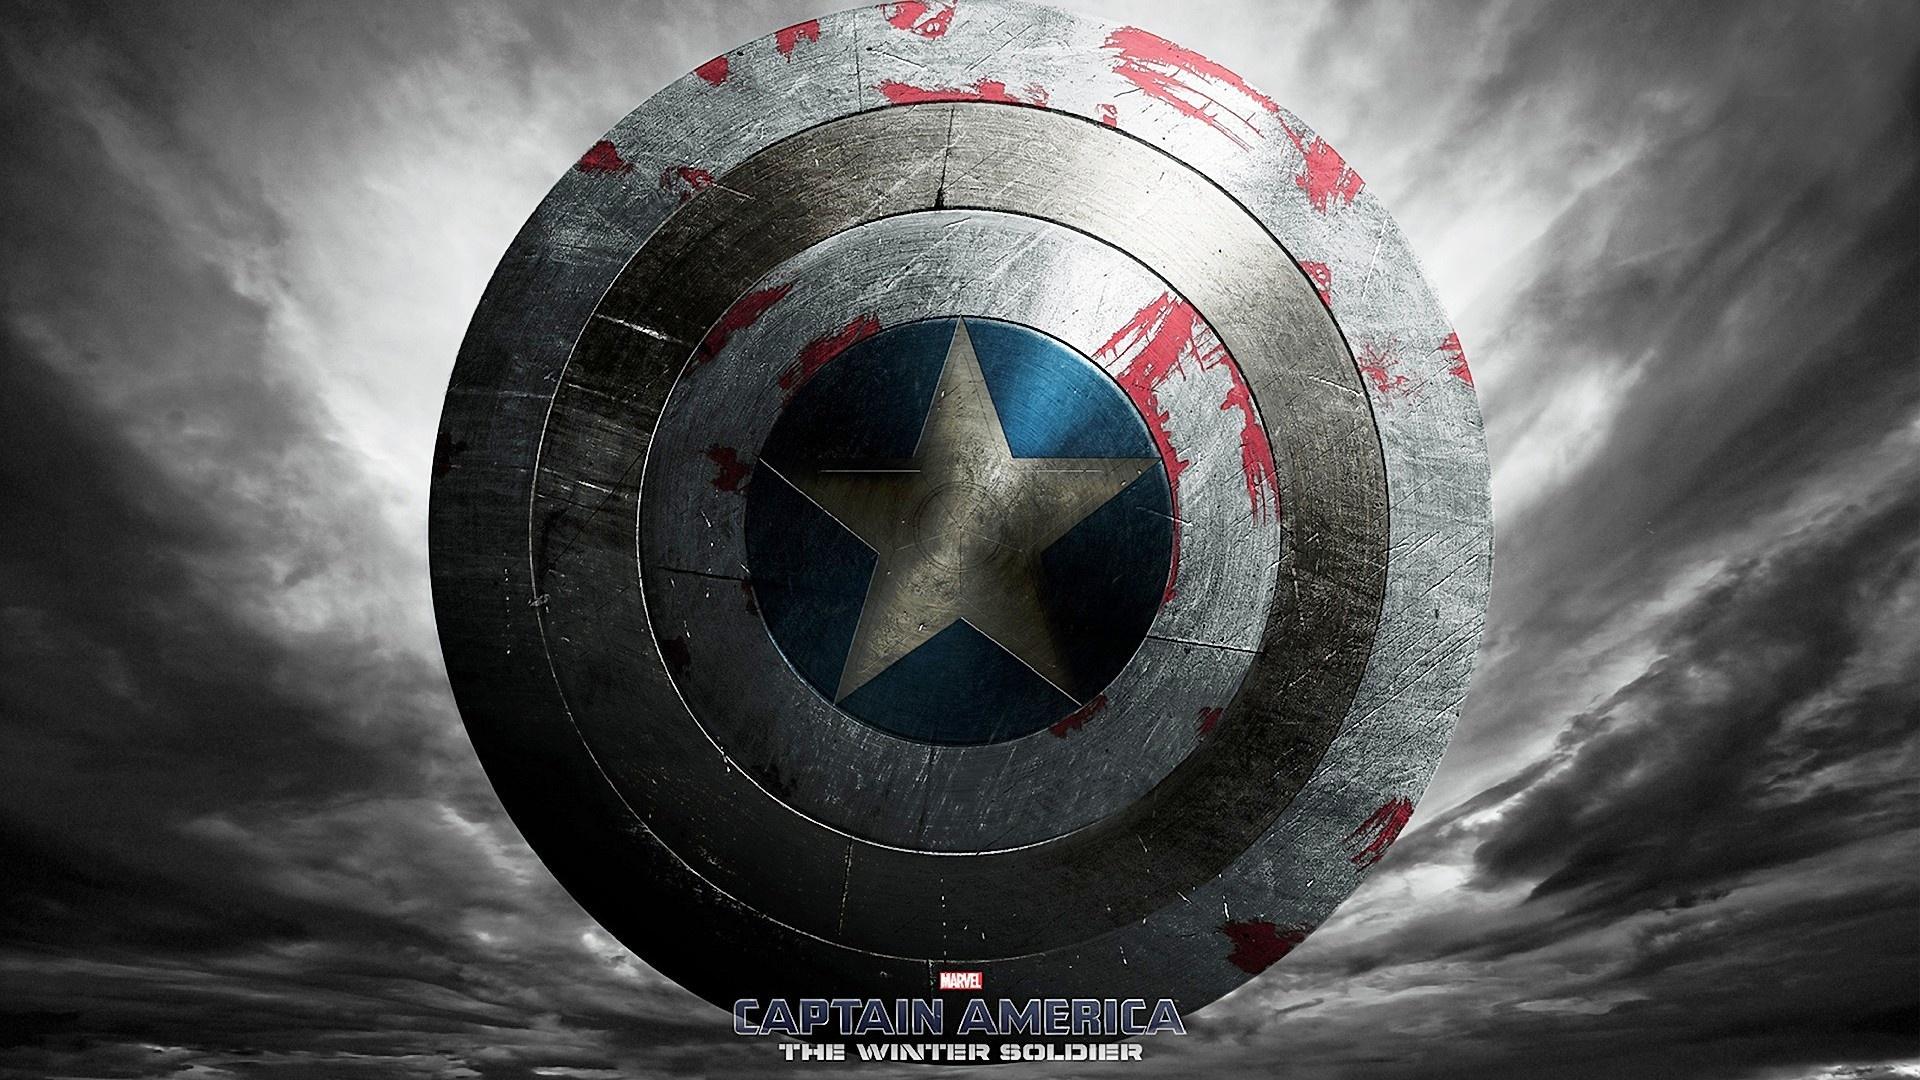 Captain America The Winter Soldier Wallpaper: Captain America Winter Soldier Wallpaper